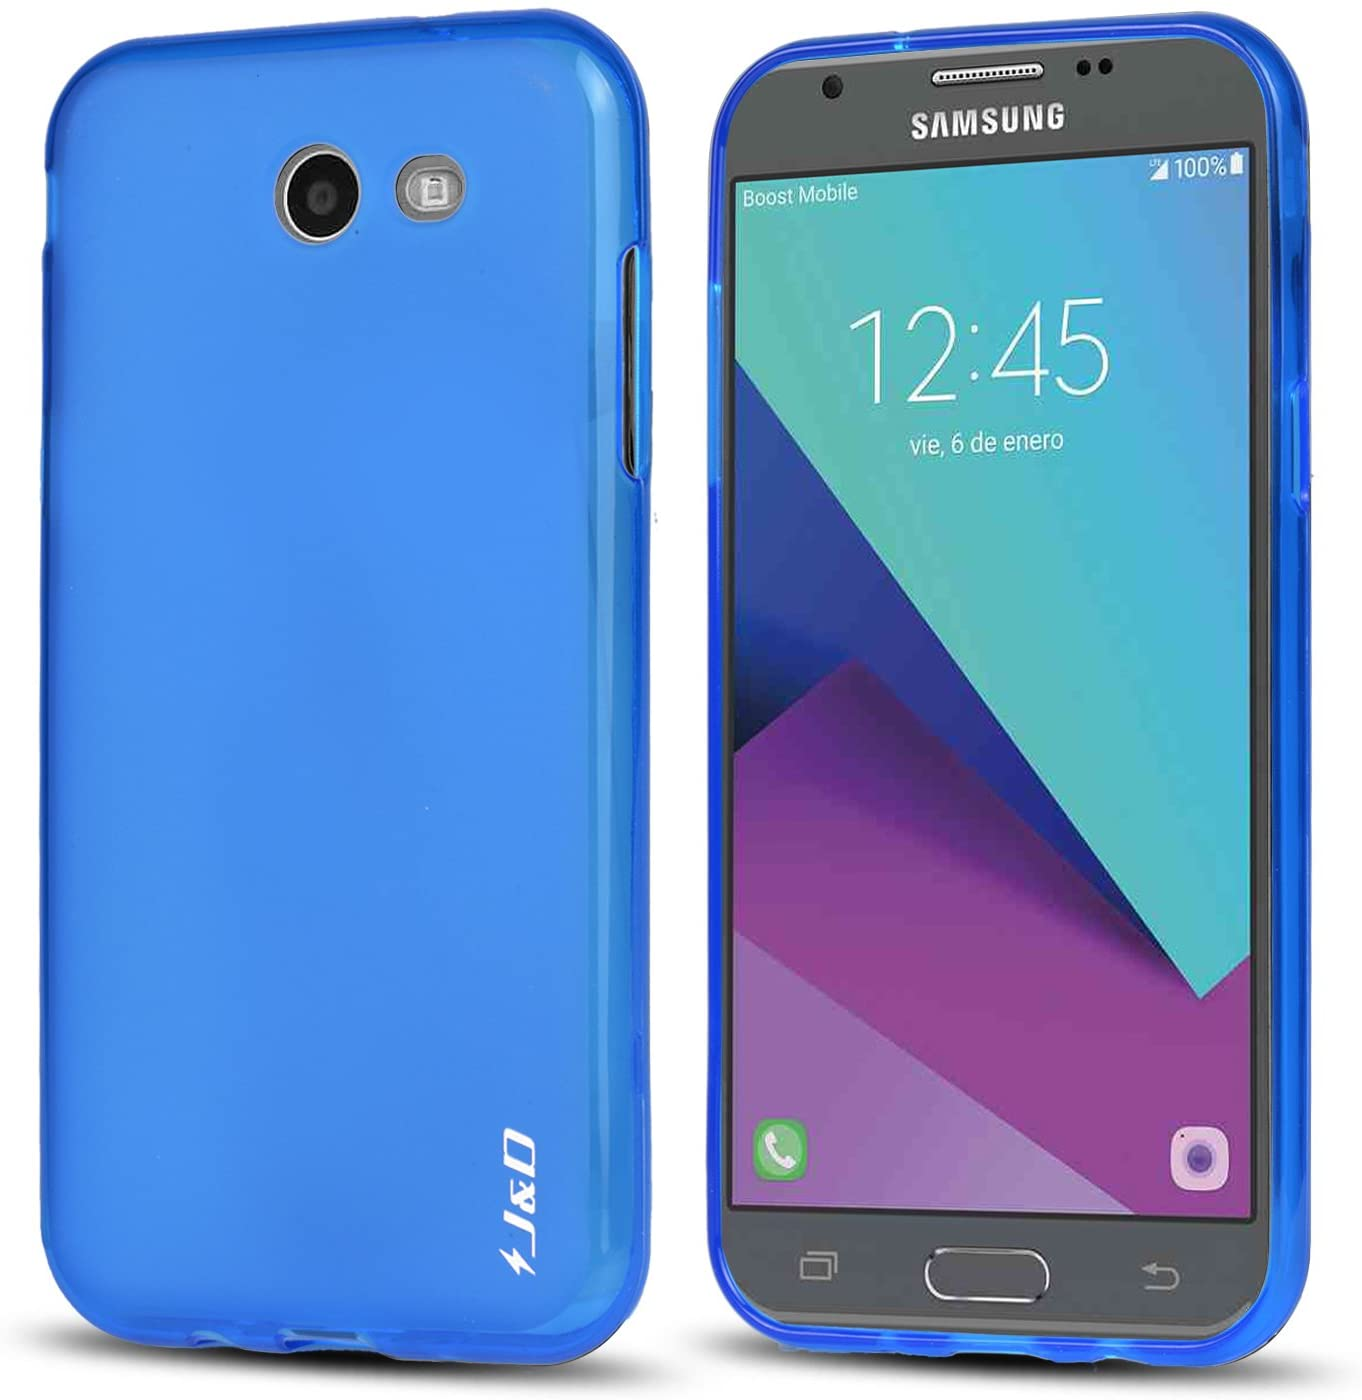 J&D Case Compatible for Samsung Galaxy J3 Emerge / J3 Prime / J3 2017 / J3 Eclipse/Sol 2 Case, [Drop Protection] [Slim Cushion] Shockproof Protective TPU Slim Case for Galaxy J3 Emerge Bumper Case